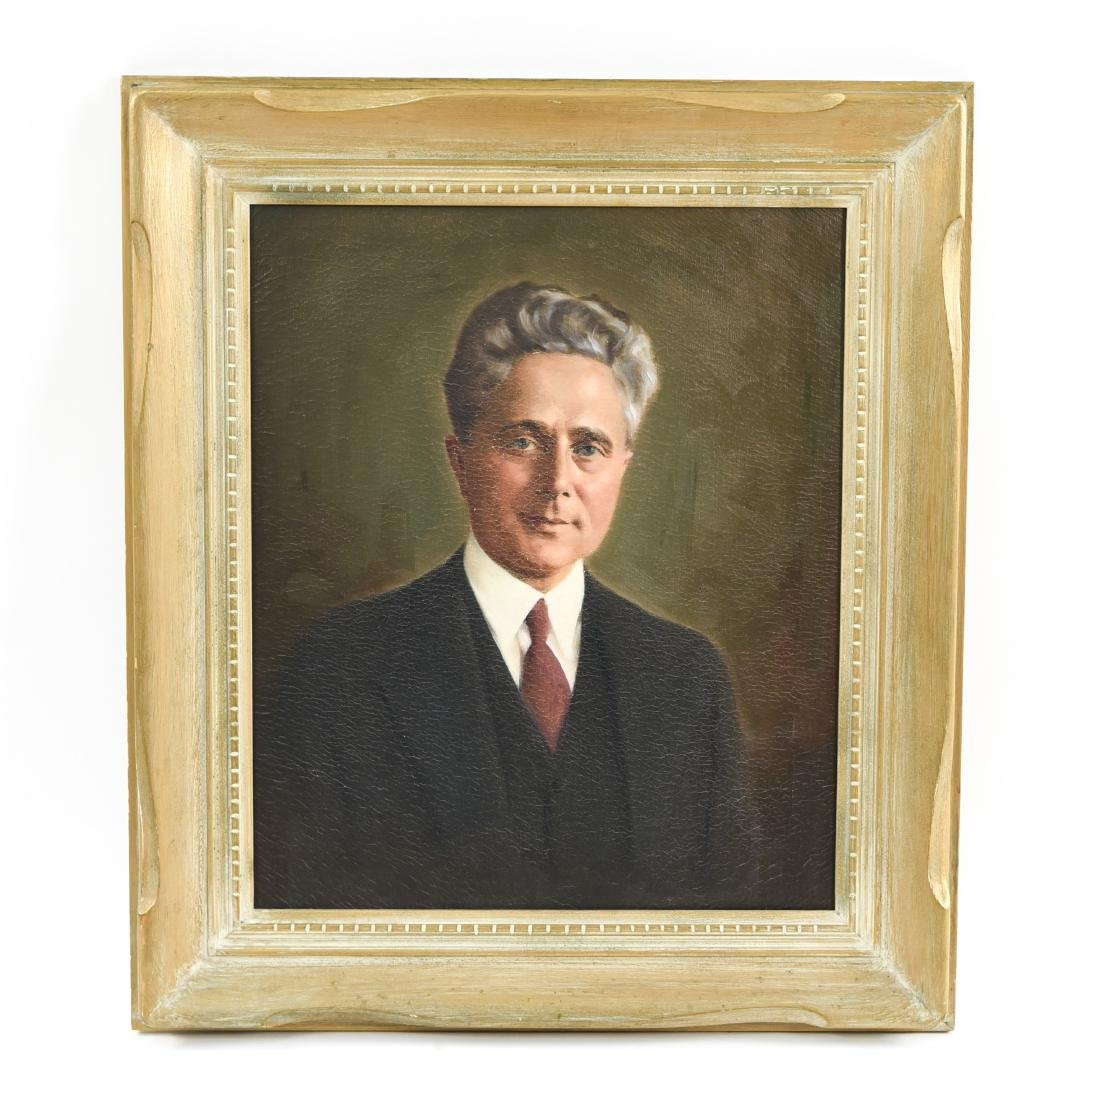 O/C PORTRAIT OF A MAN